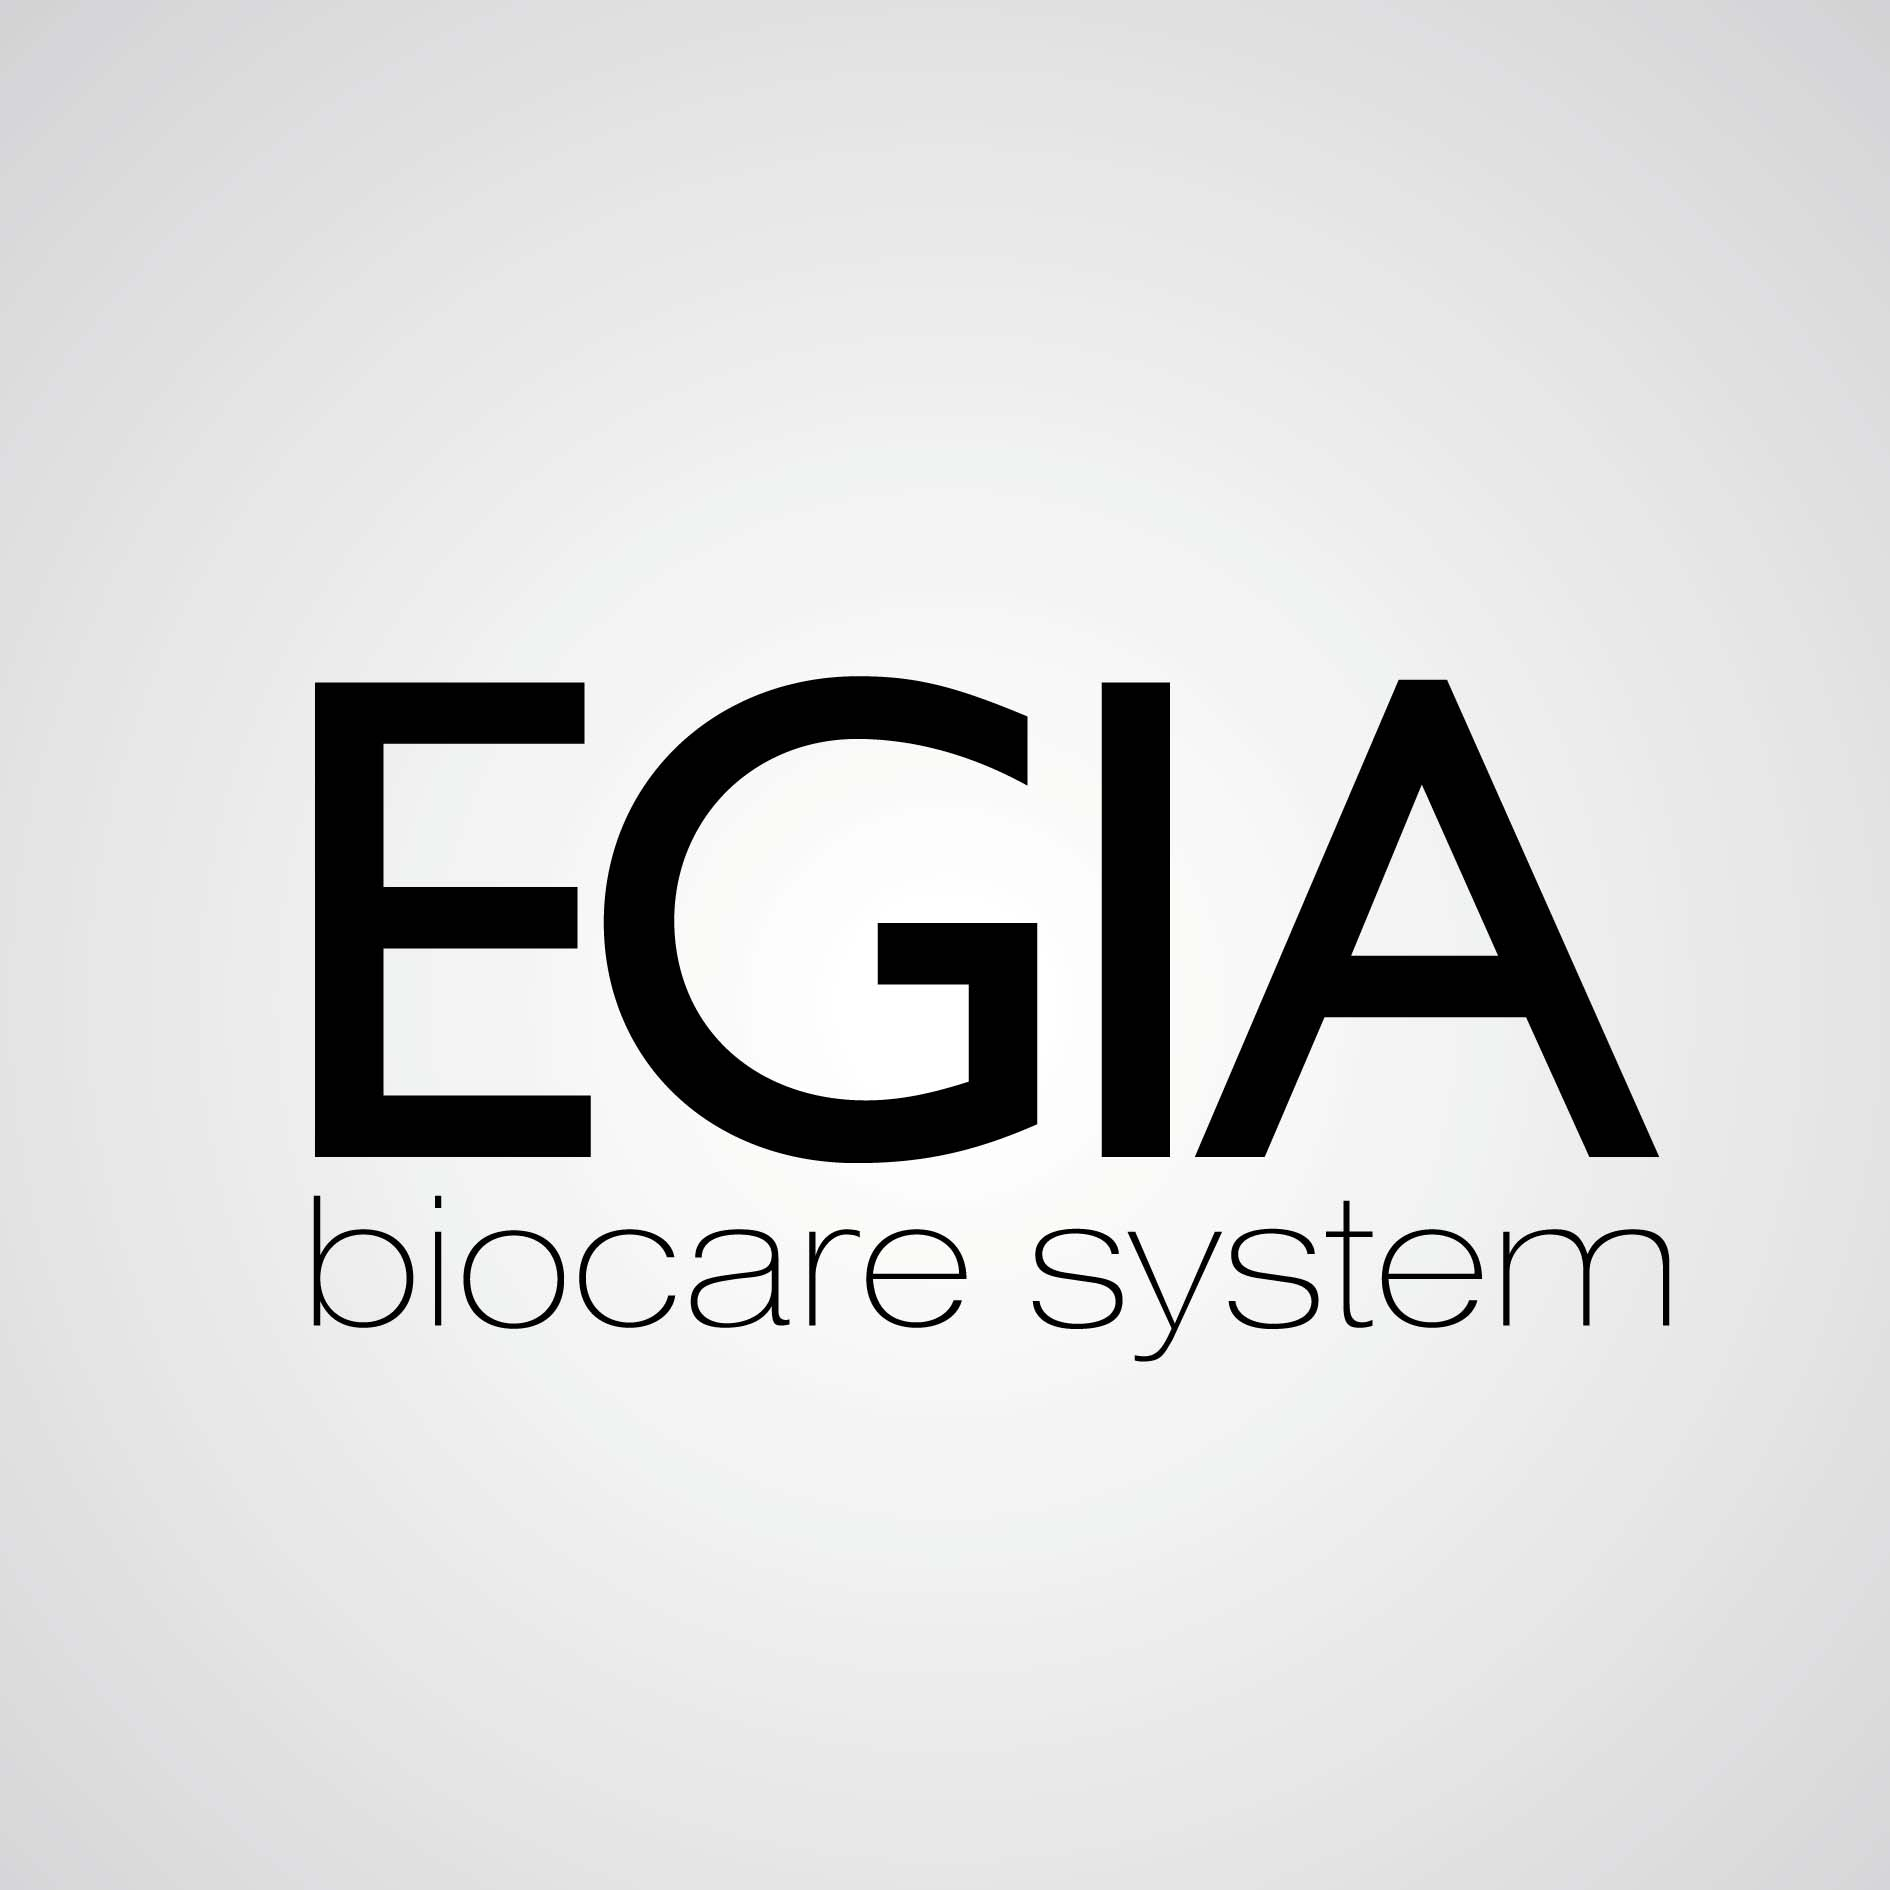 Egia biocare system купить.